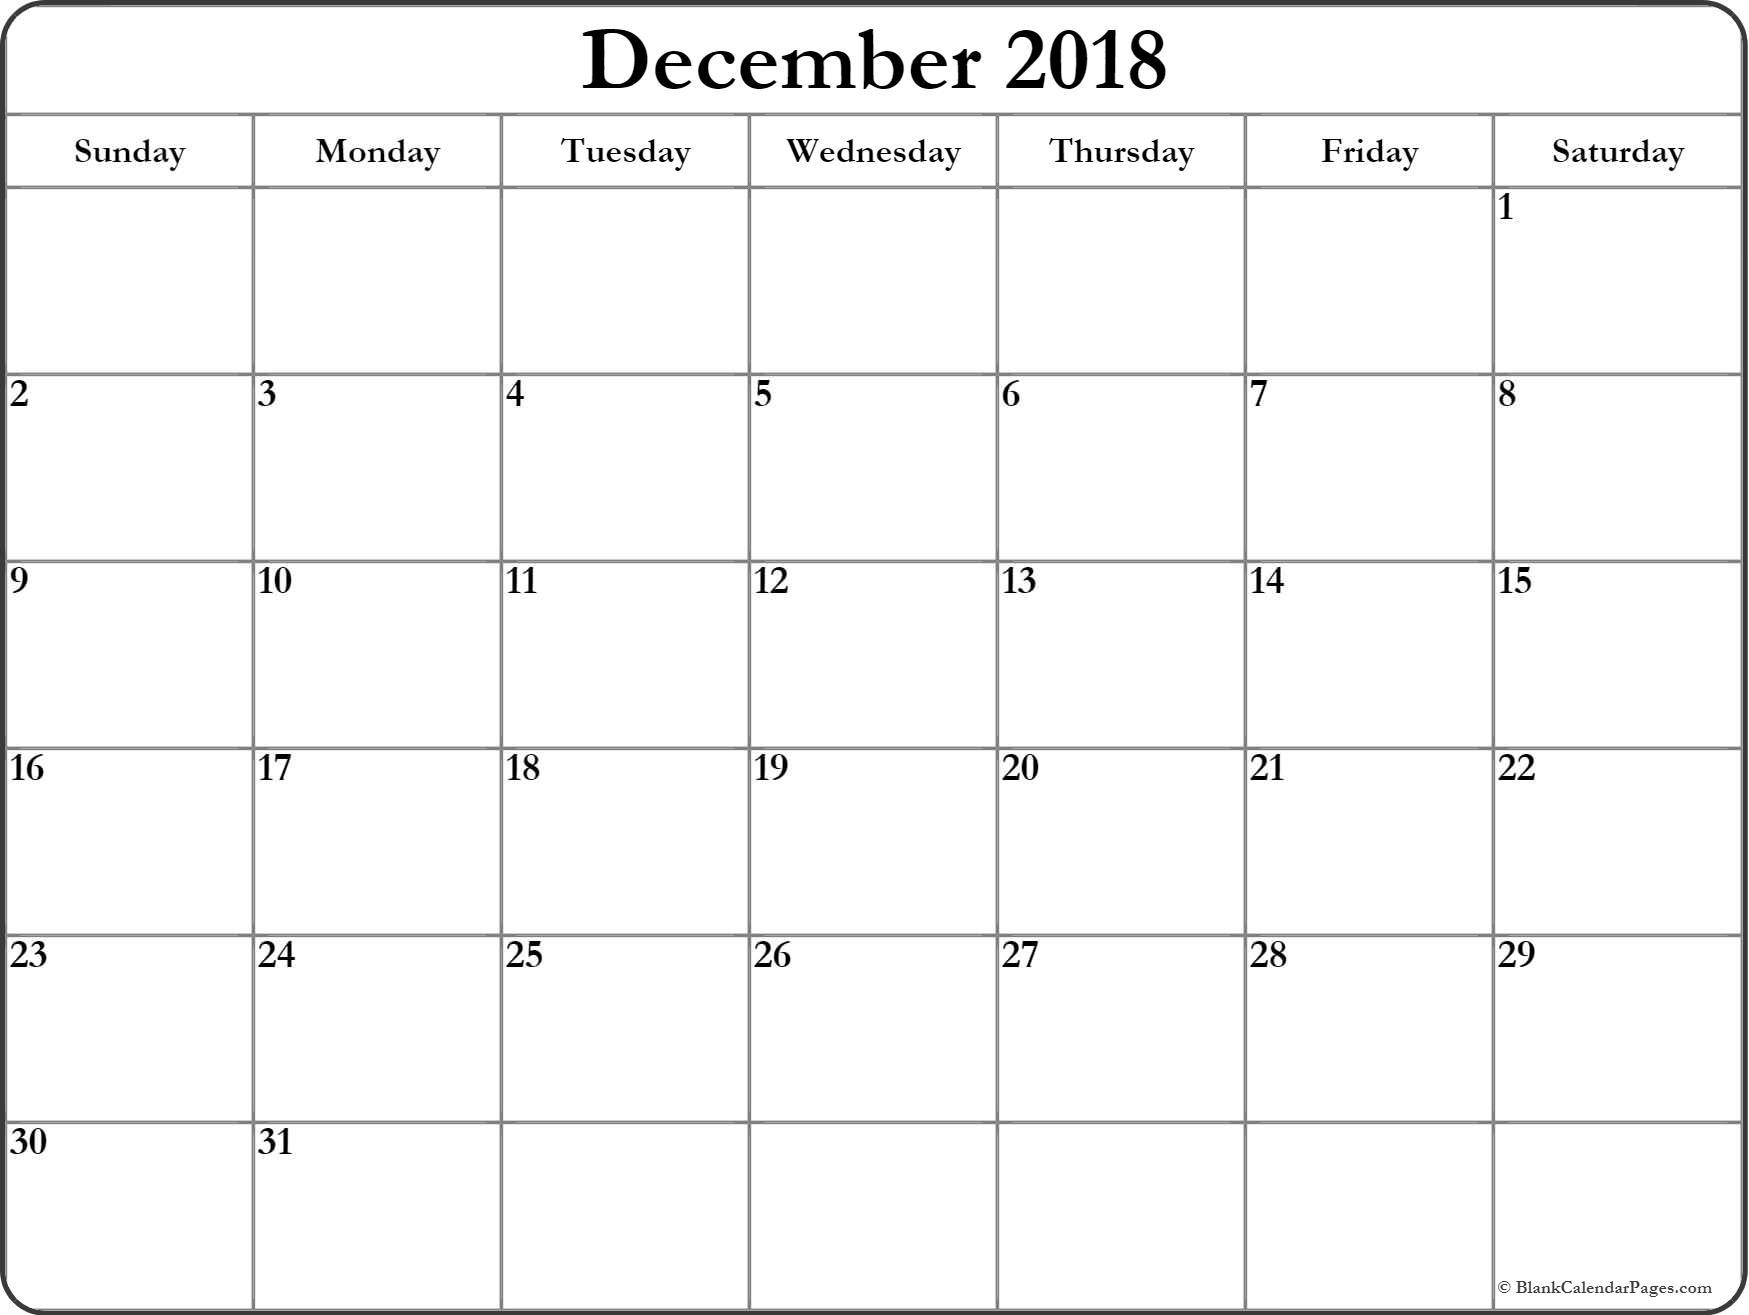 December 2018 Calendar | Free Printable Monthly Calendars within Blank Calendar Printable December Template